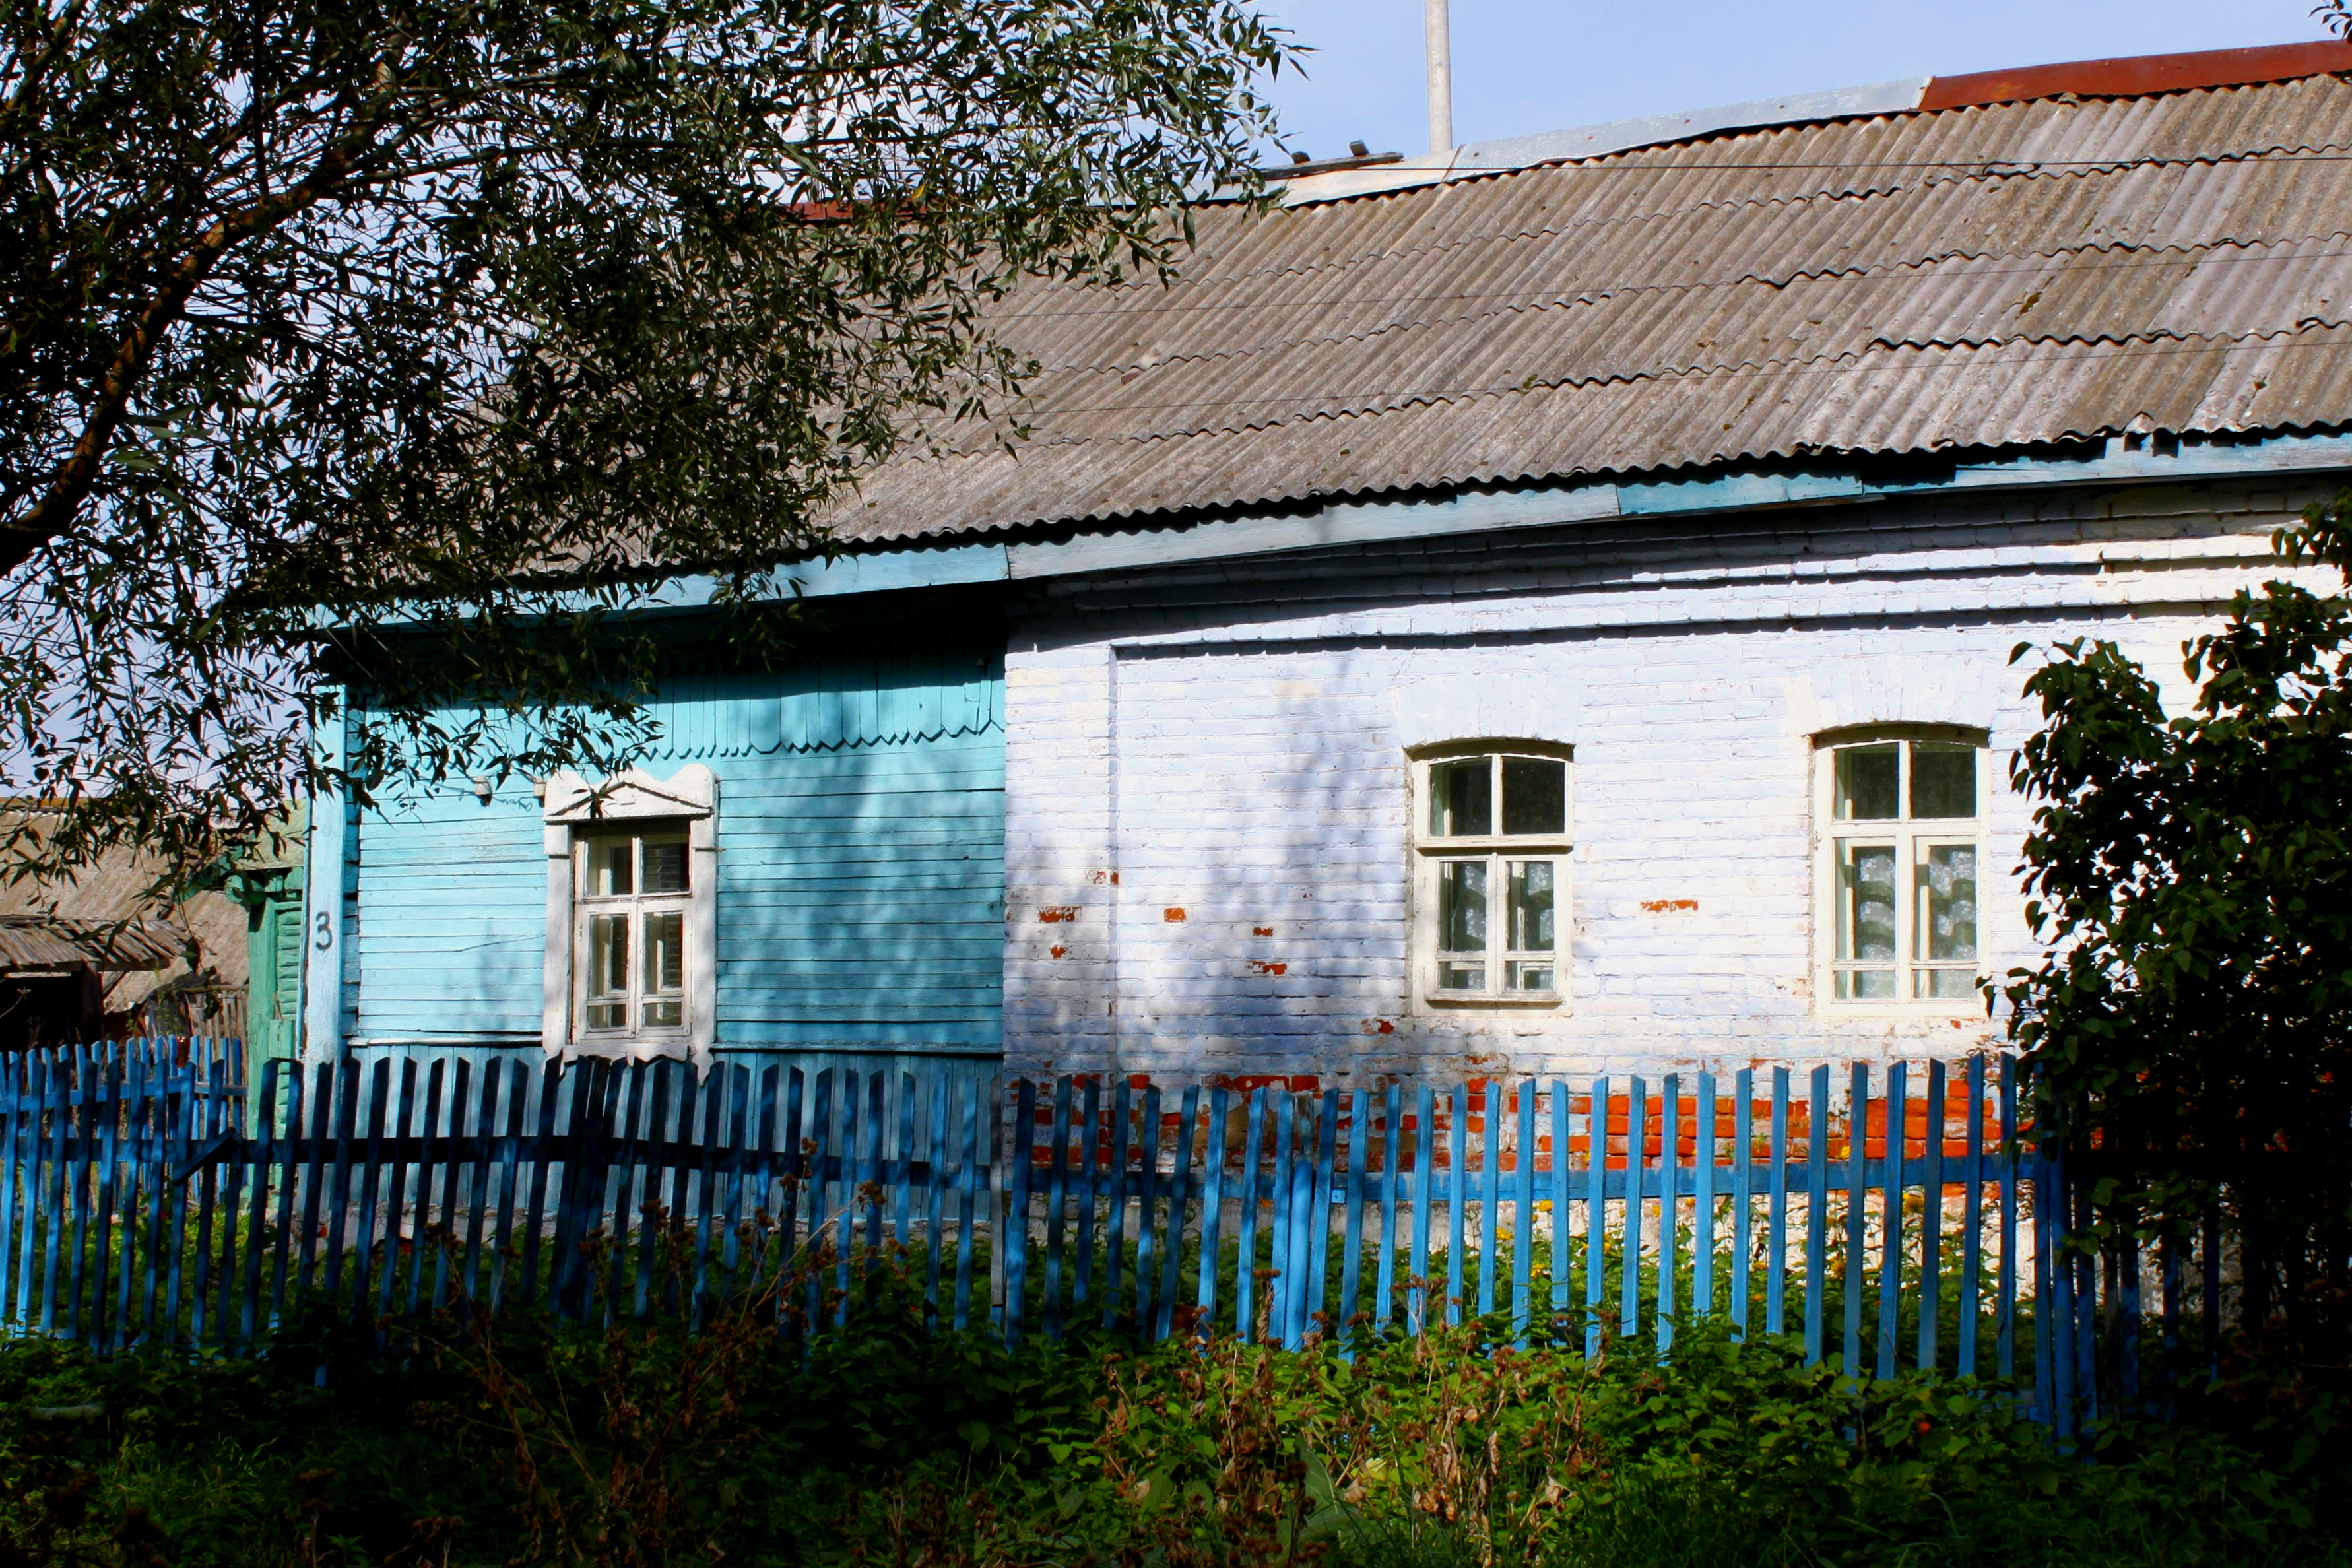 vente maison de campagne suvorov tulskaya oblast russie ivshino 3. Black Bedroom Furniture Sets. Home Design Ideas